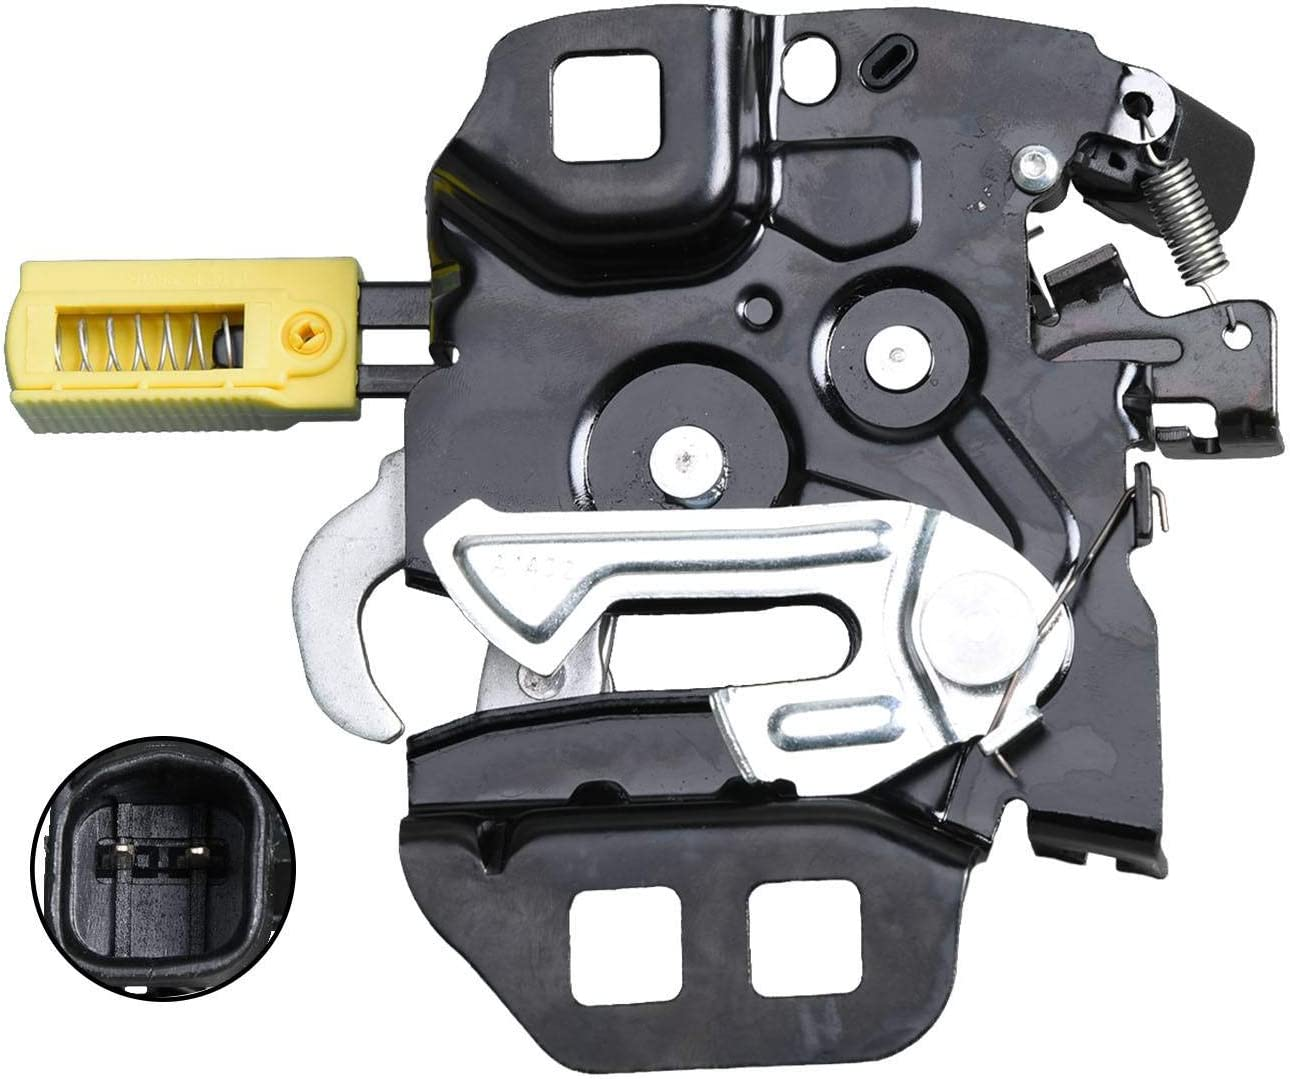 Bapmic FT4Z-16700-A Hood Latch Lock for Ford Edge 15-18